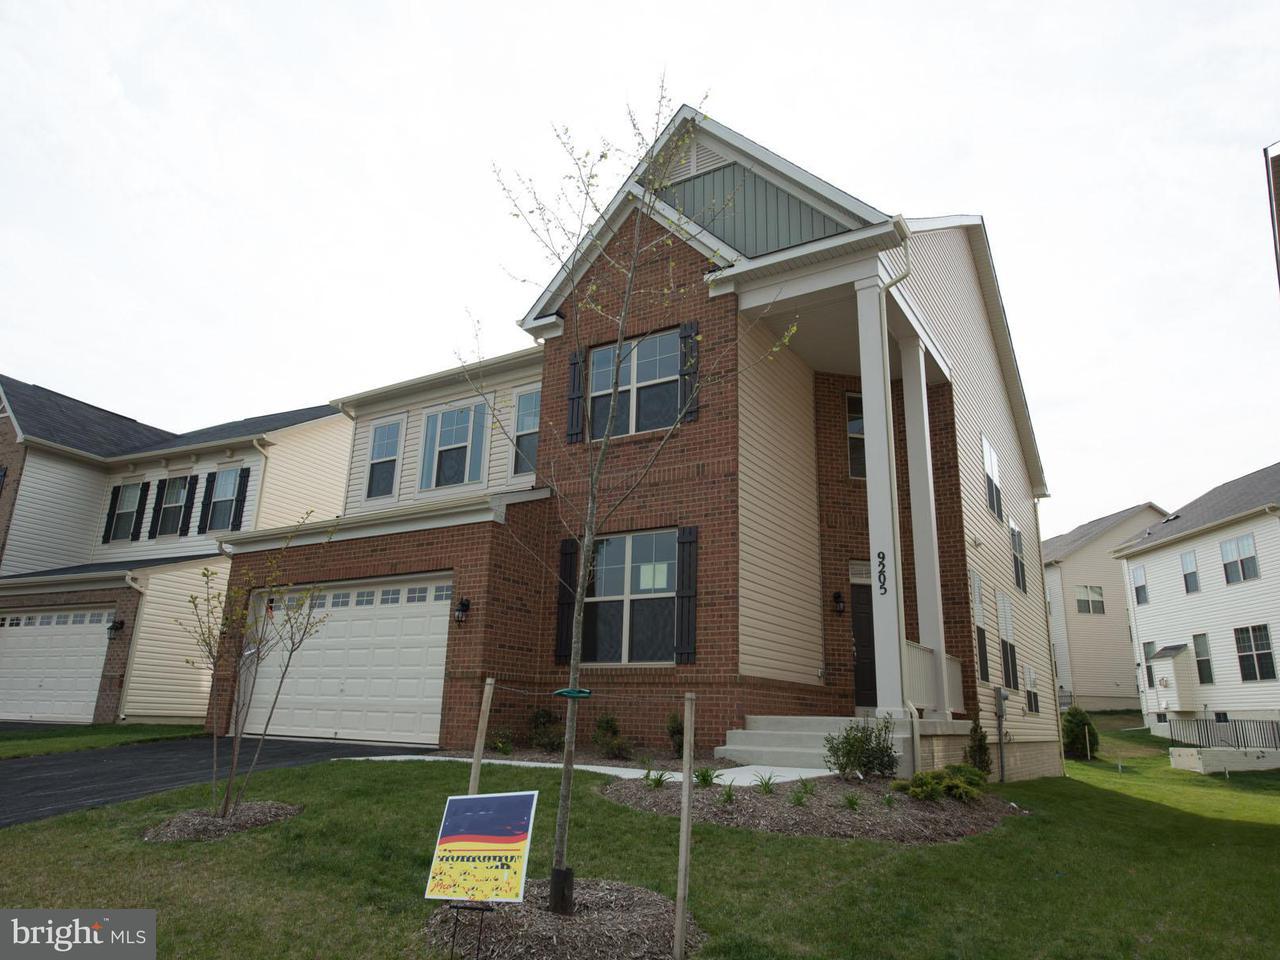 Single Family Home for Sale at 9105 GLENARDEN PKWY 9105 GLENARDEN PKWY Glenarden, Maryland 20706 United States